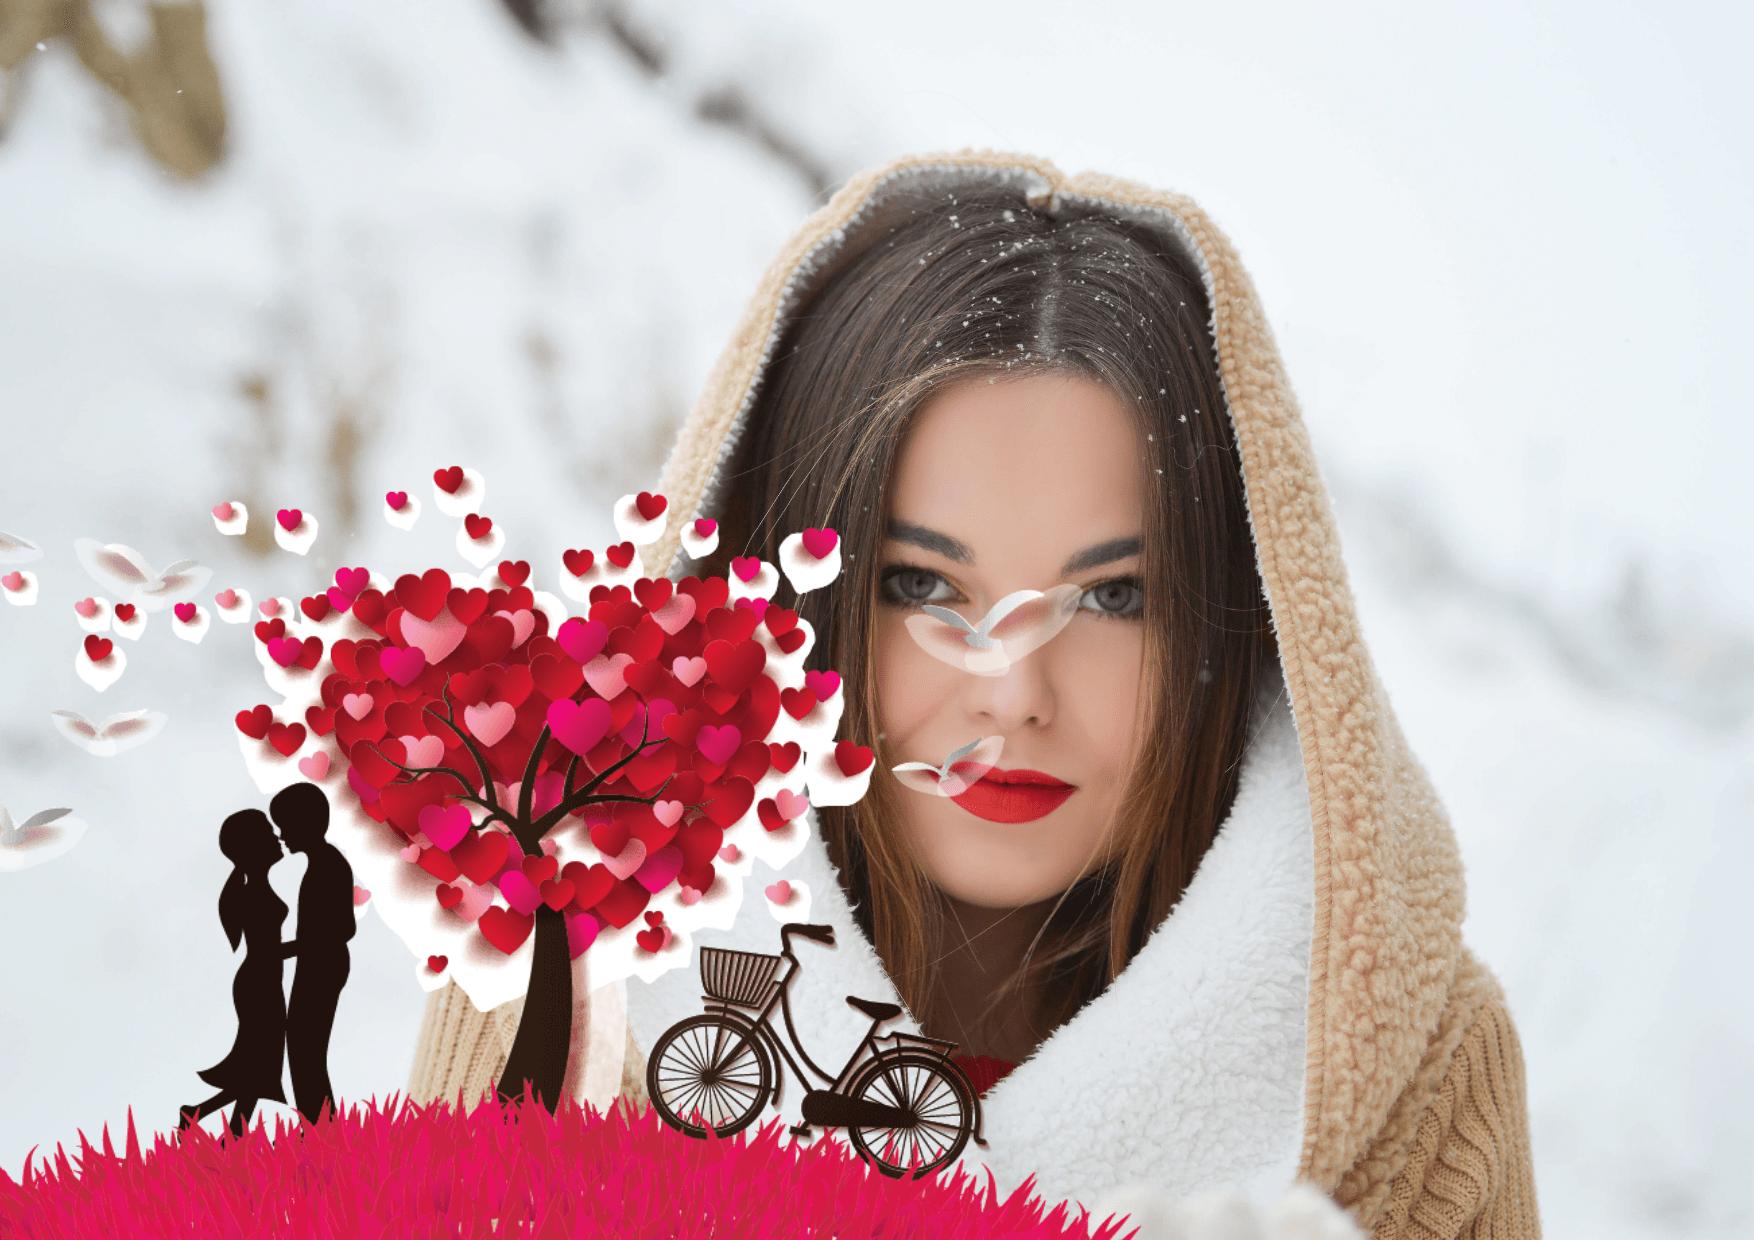 Woman,                Beauty,                Season,                Spring,                Image,                Avatar,                Love,                White,                Black,                Red,                 Free Image